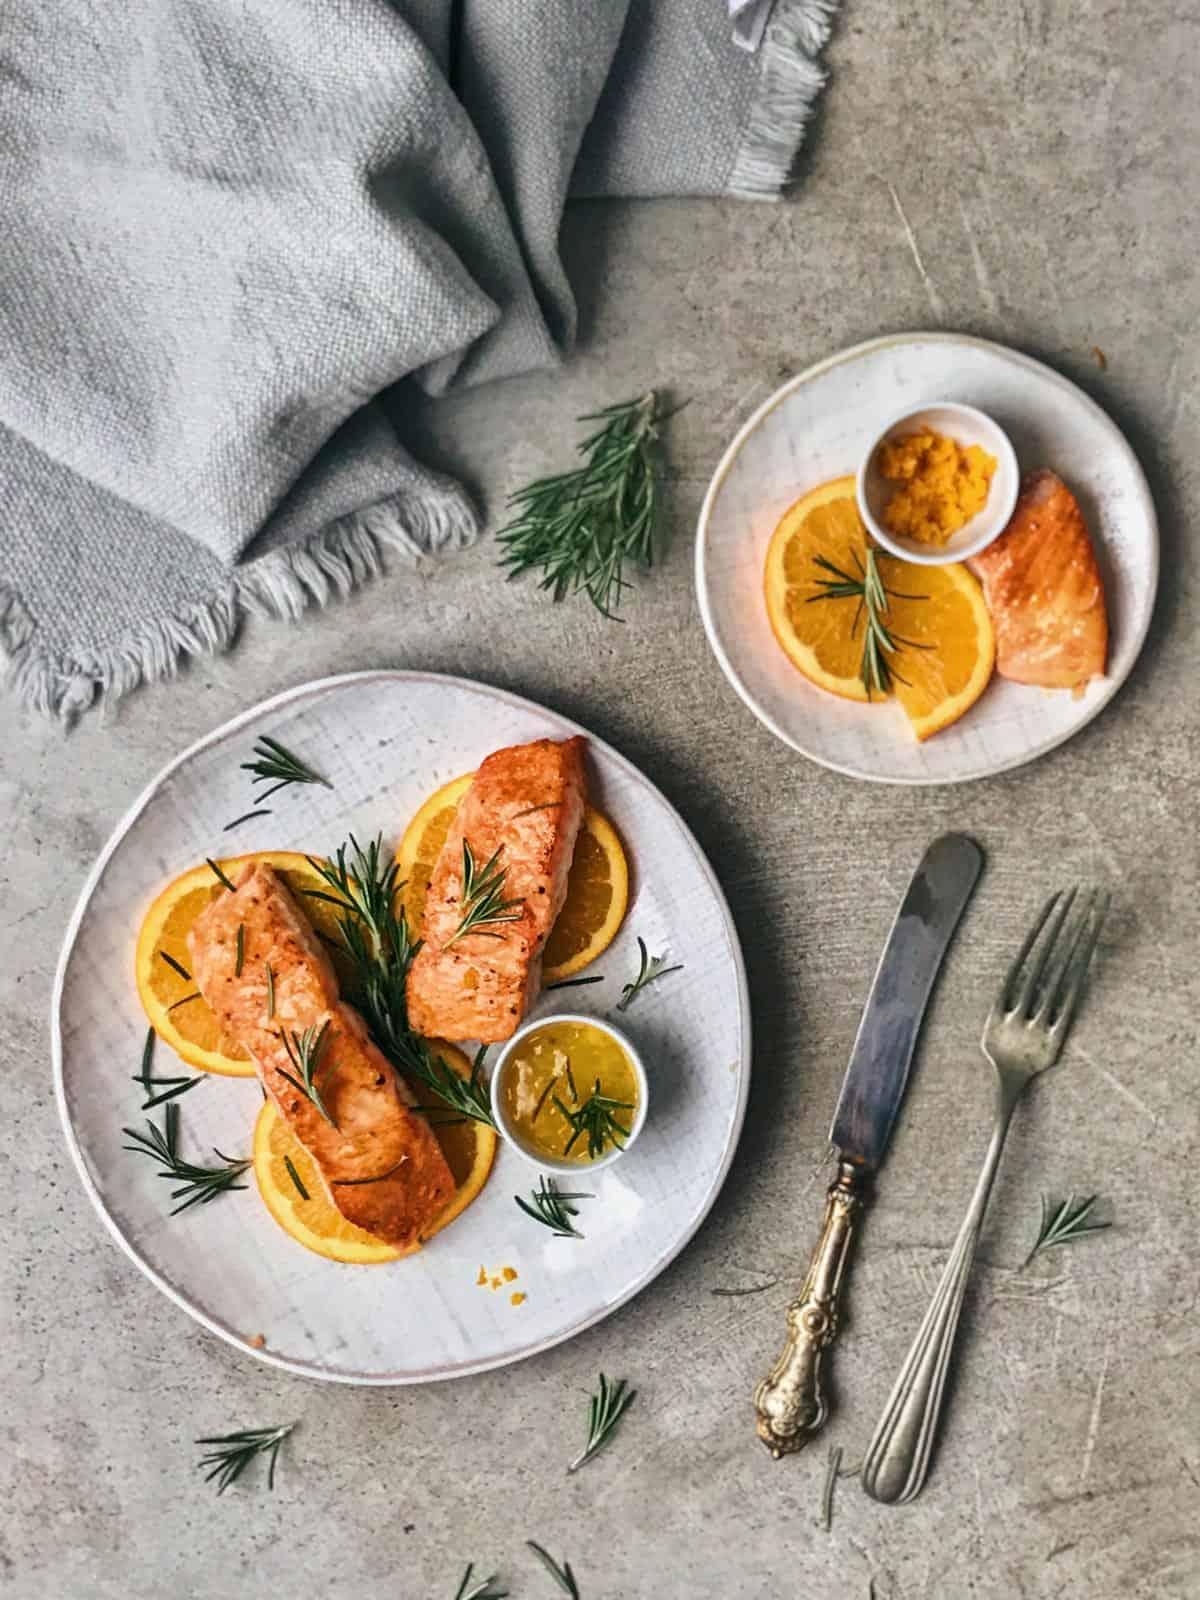 Recetas de salmón sanas